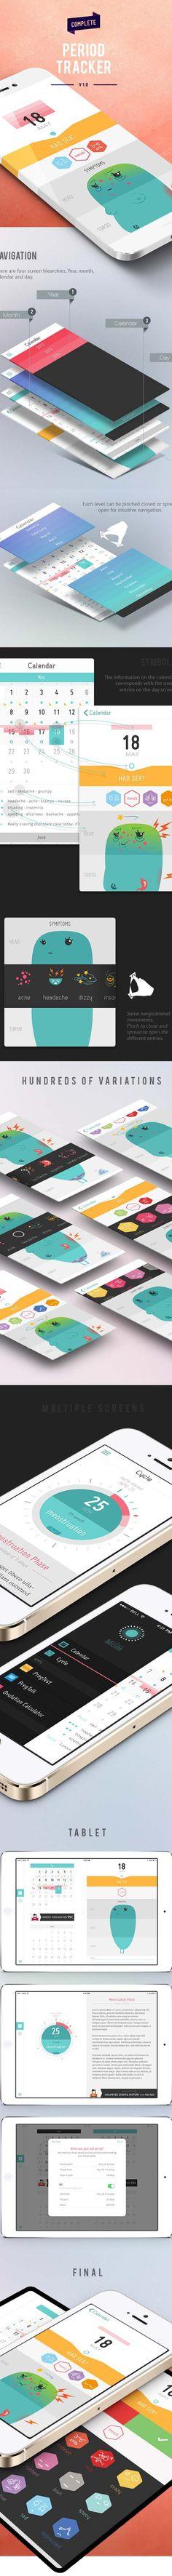 Mobile UI Design Inspiration #10 | Smashfreakz